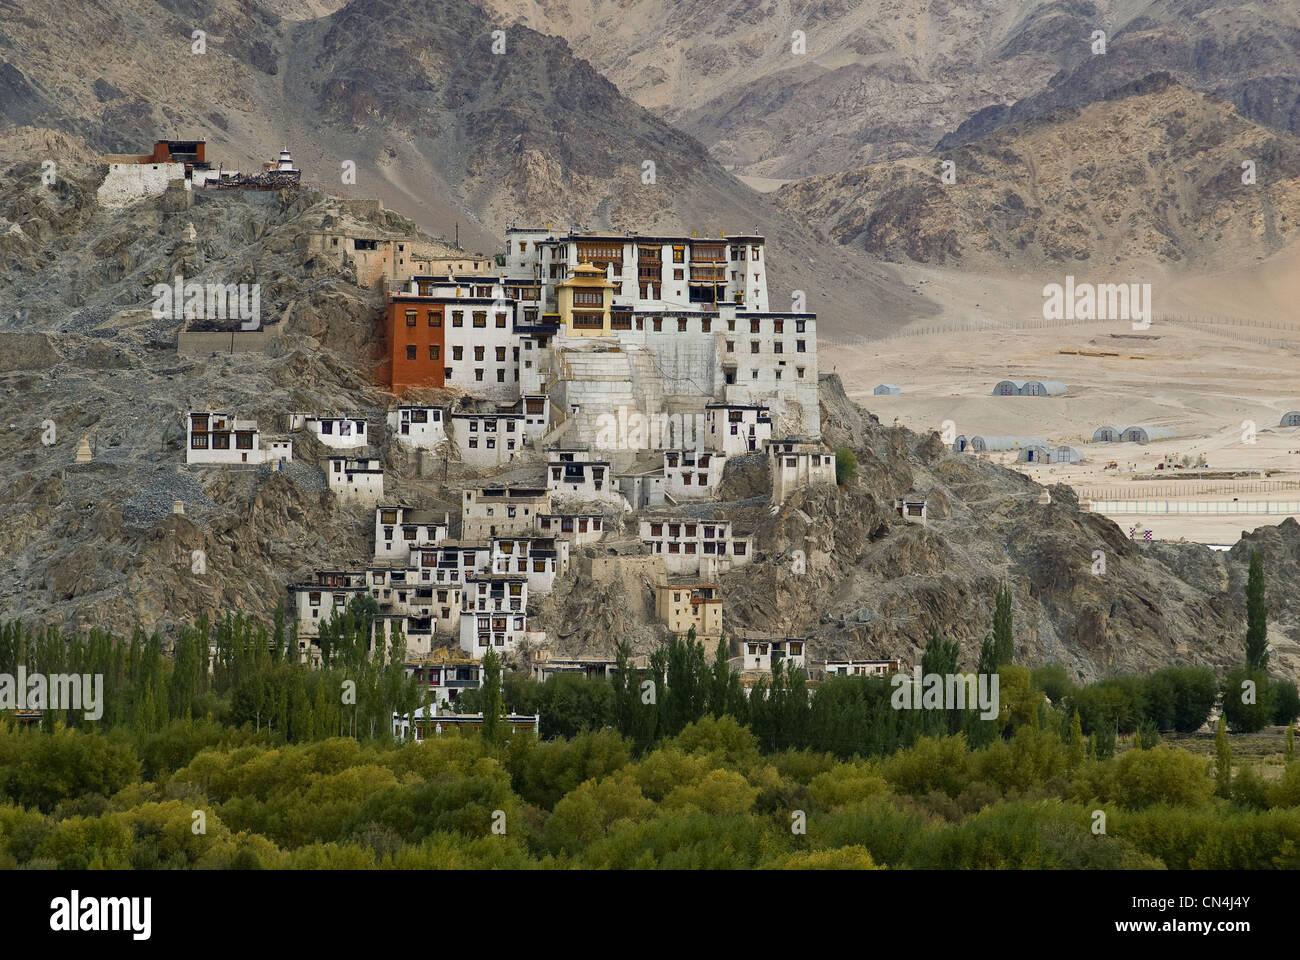 India, Jammu and Kashmir State, Ladakh Region, Himalayan foothills, monastery above Leh - Stock Image